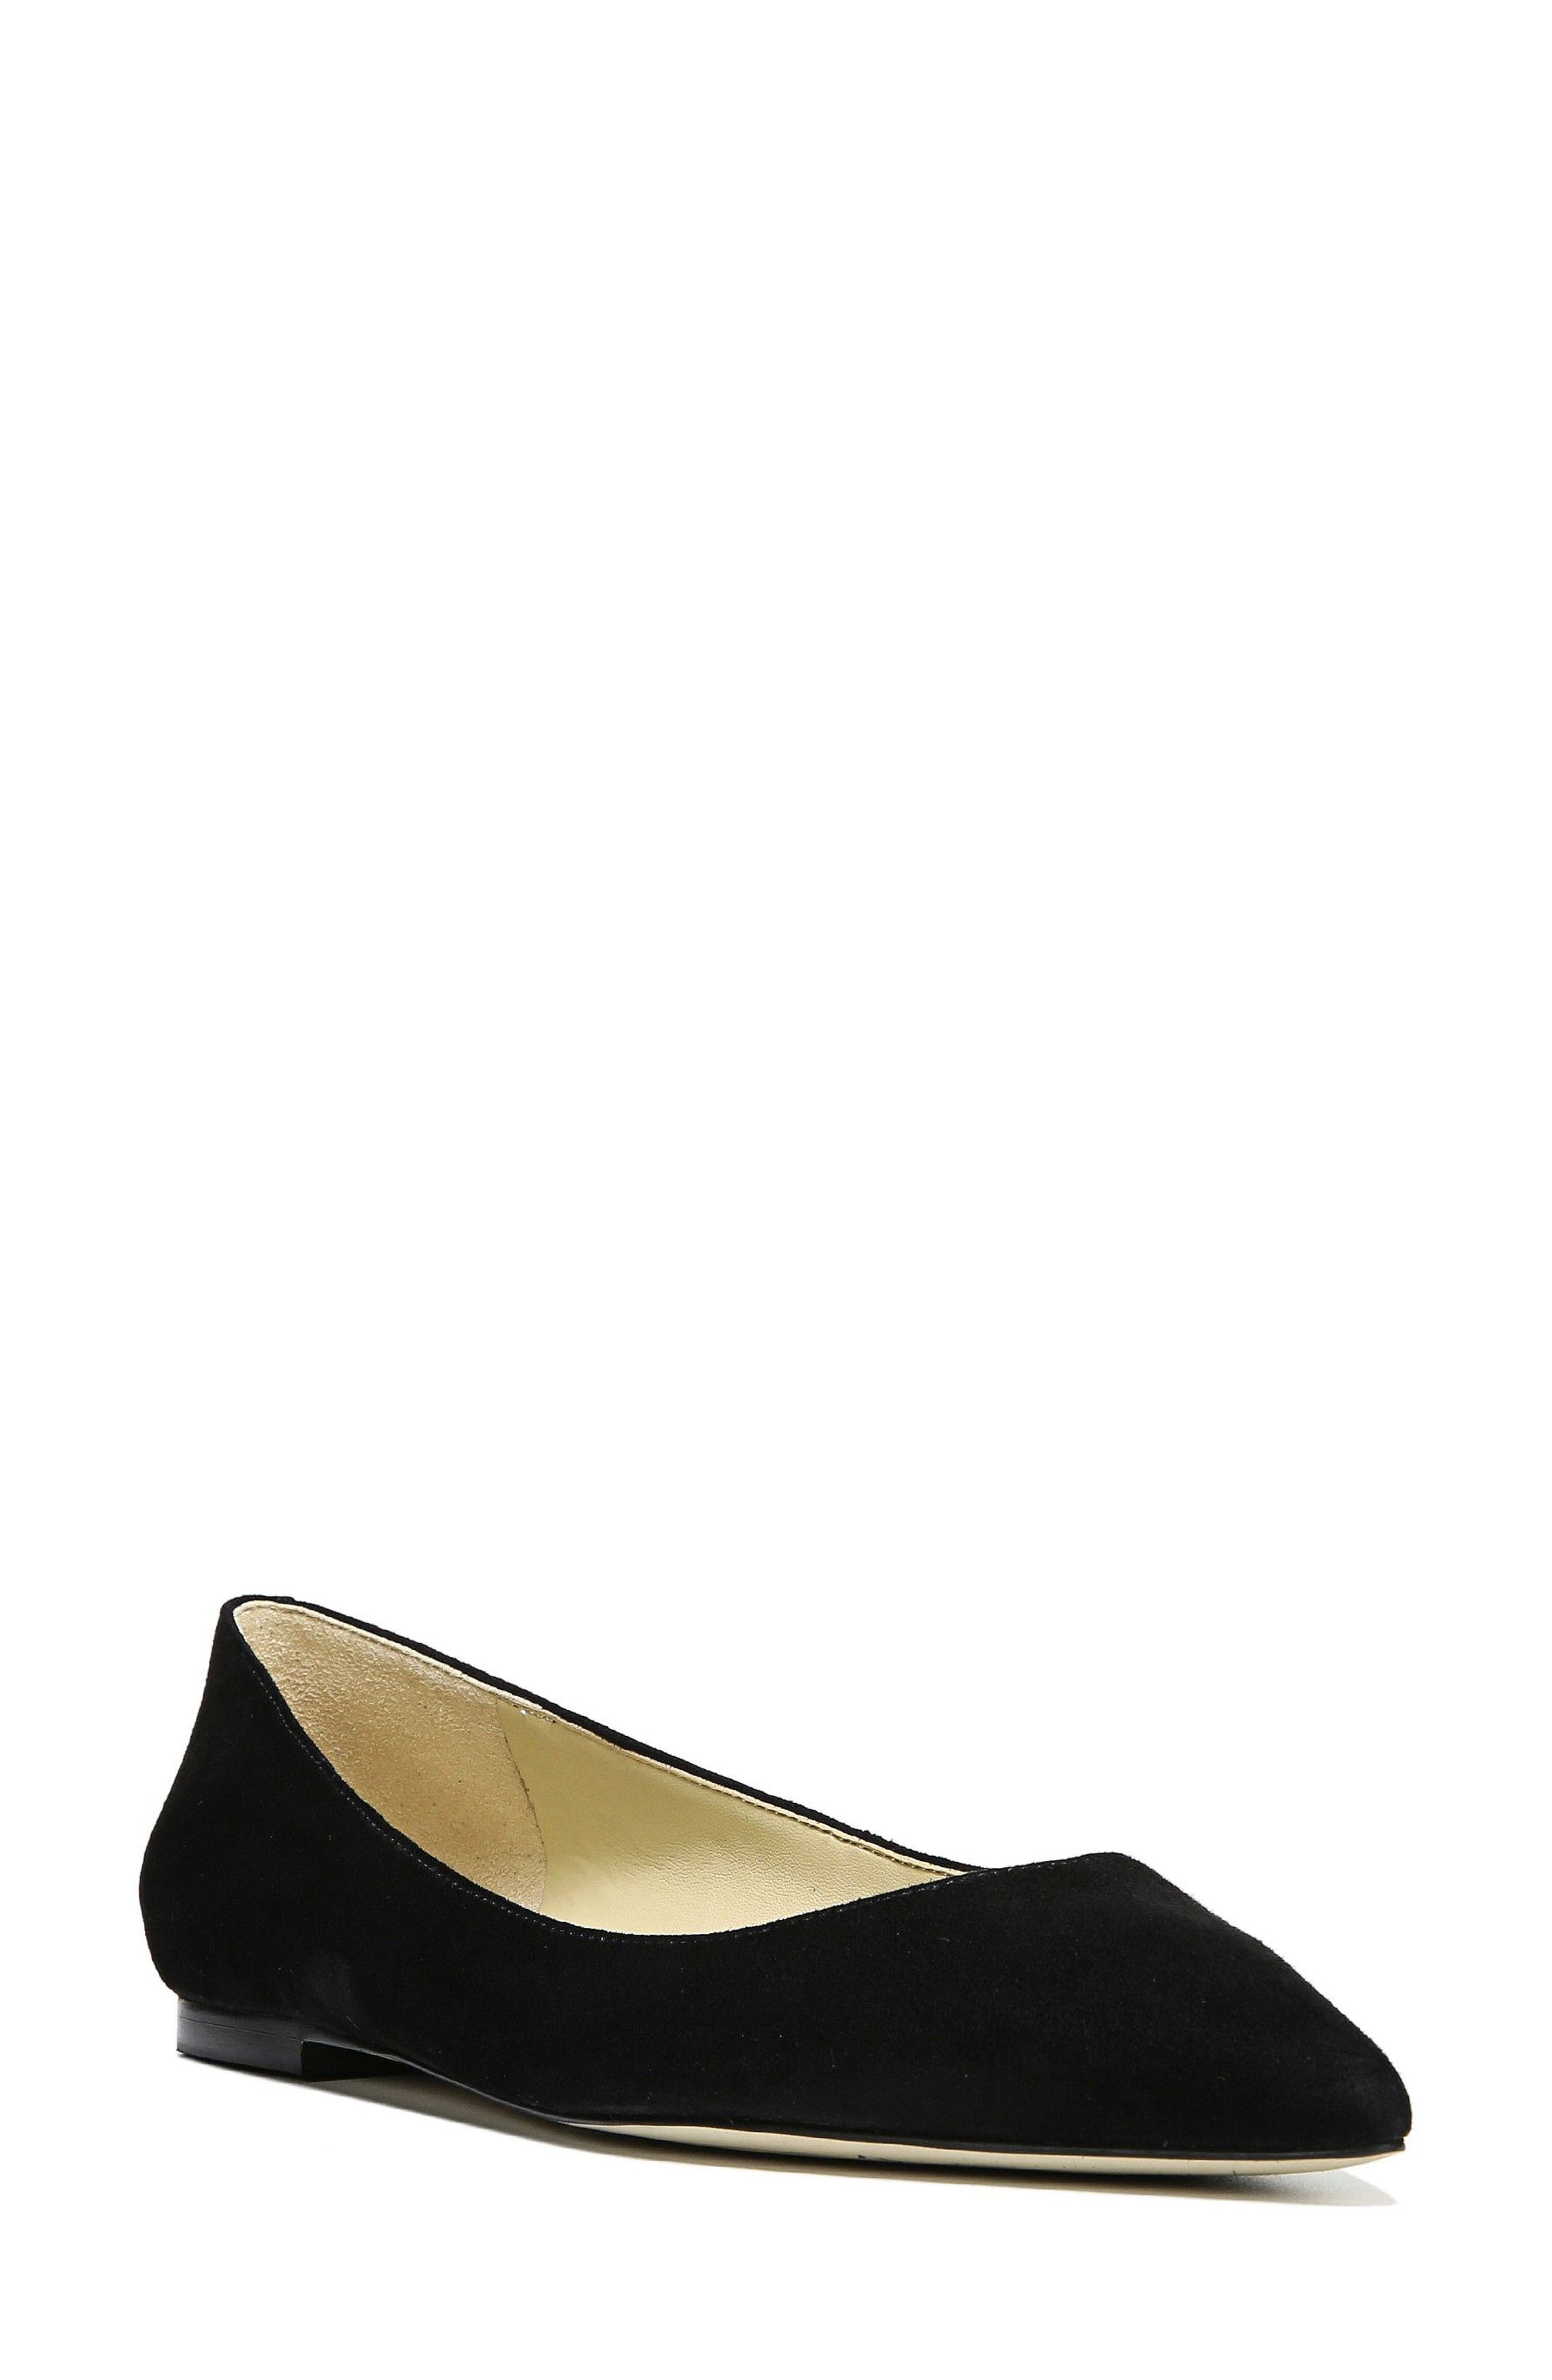 'Rae' Pointy Toe Ballet Flat,                             Main thumbnail 1, color,                             001